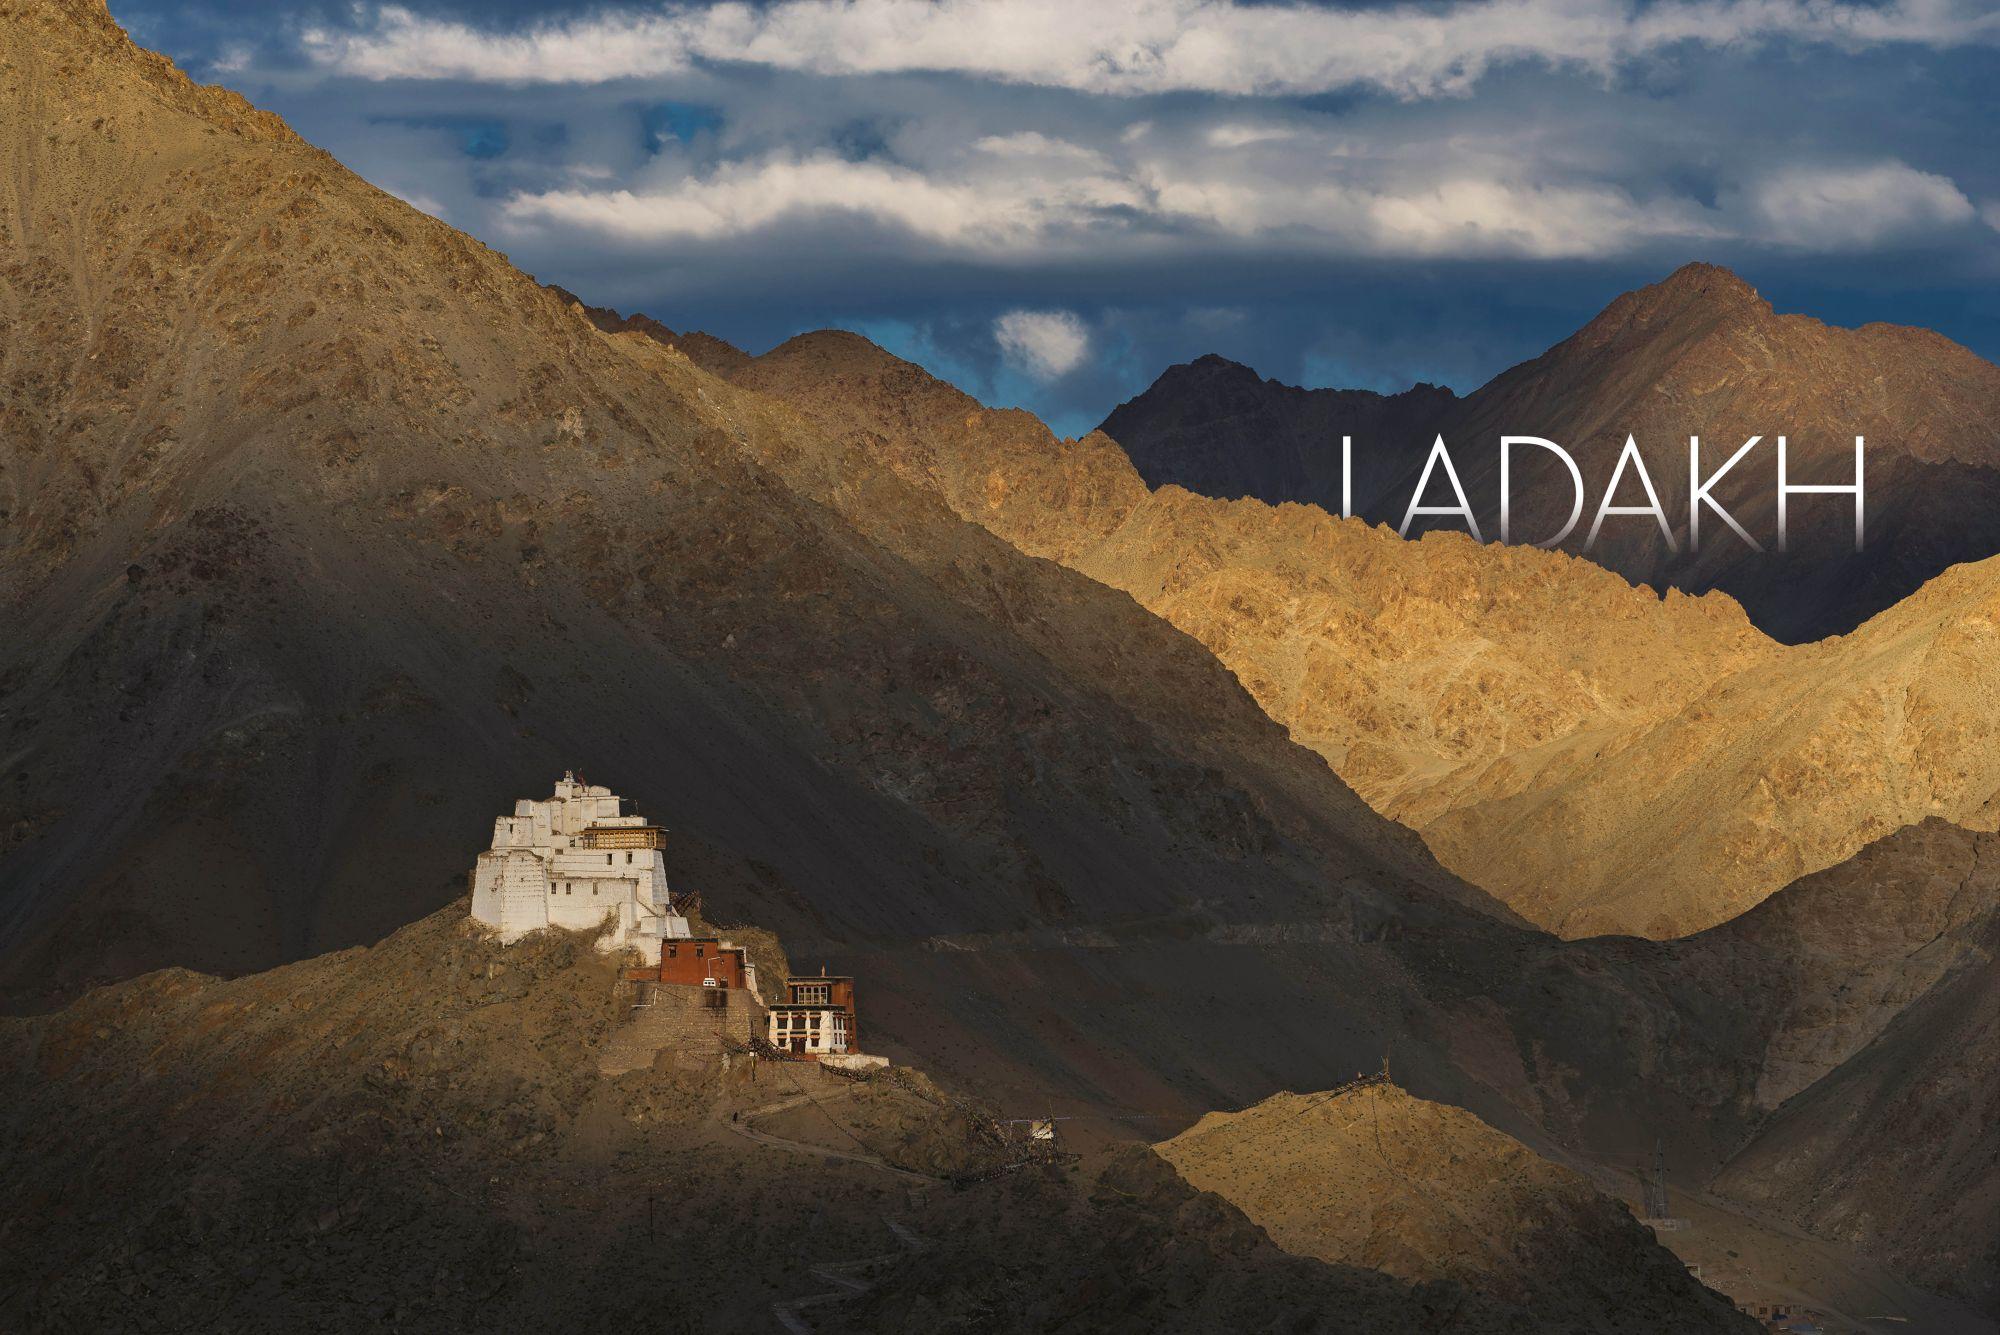 Ladakh: The Otherworldly Charm of India's Tibet